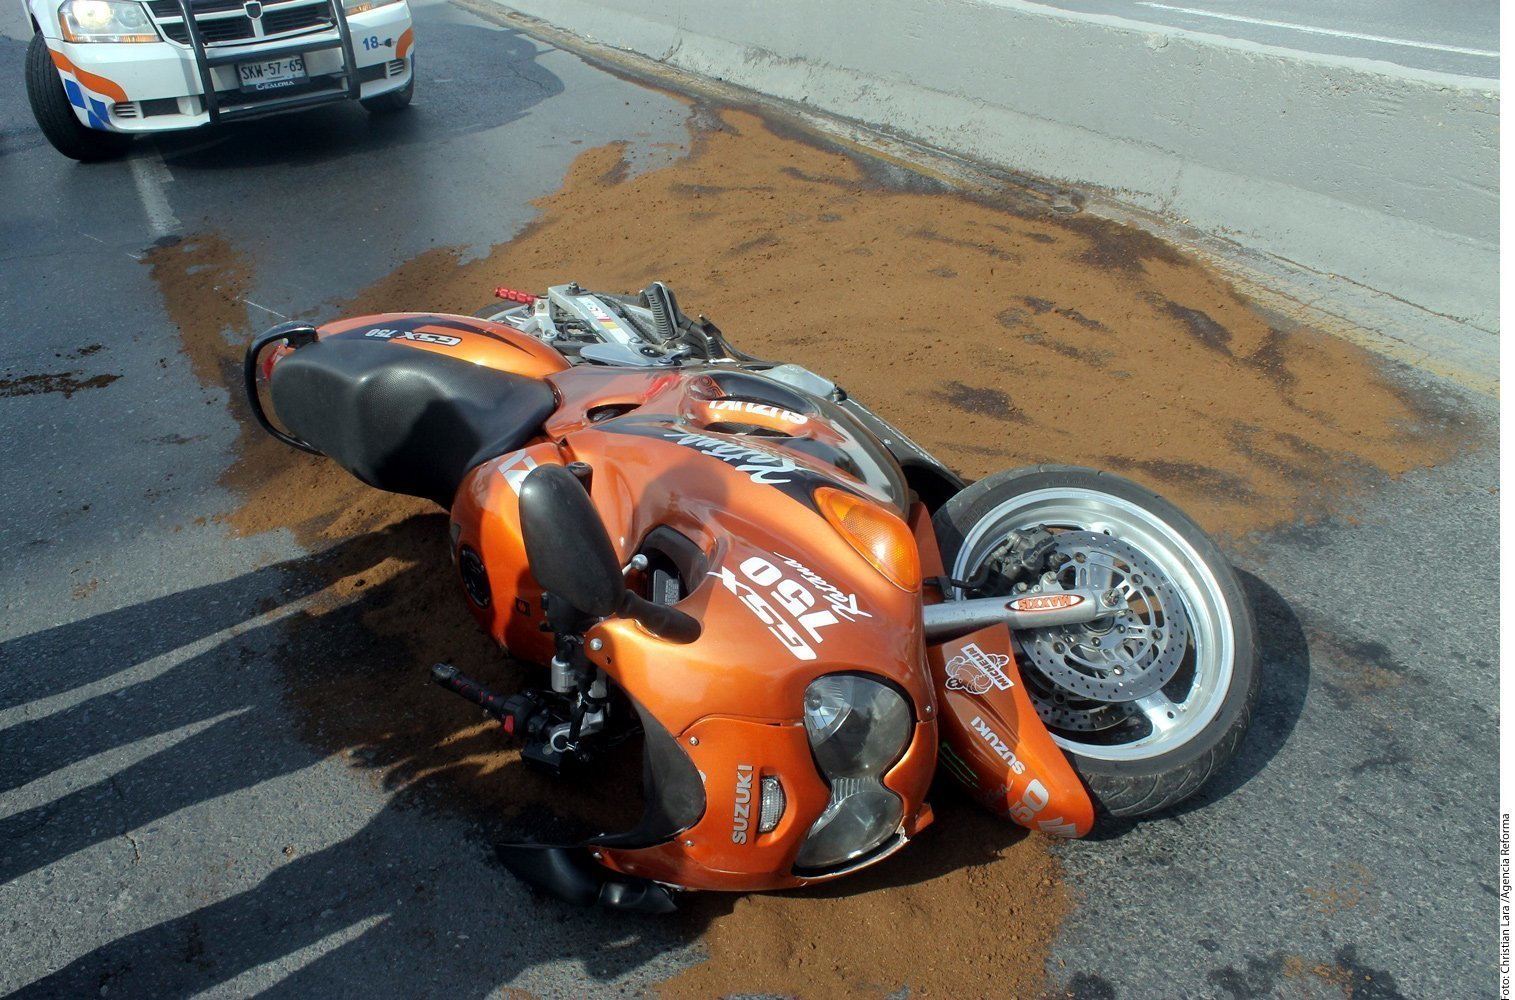 b348be00e76 Evita los accidentes en moto - The San Diego Union-Tribune